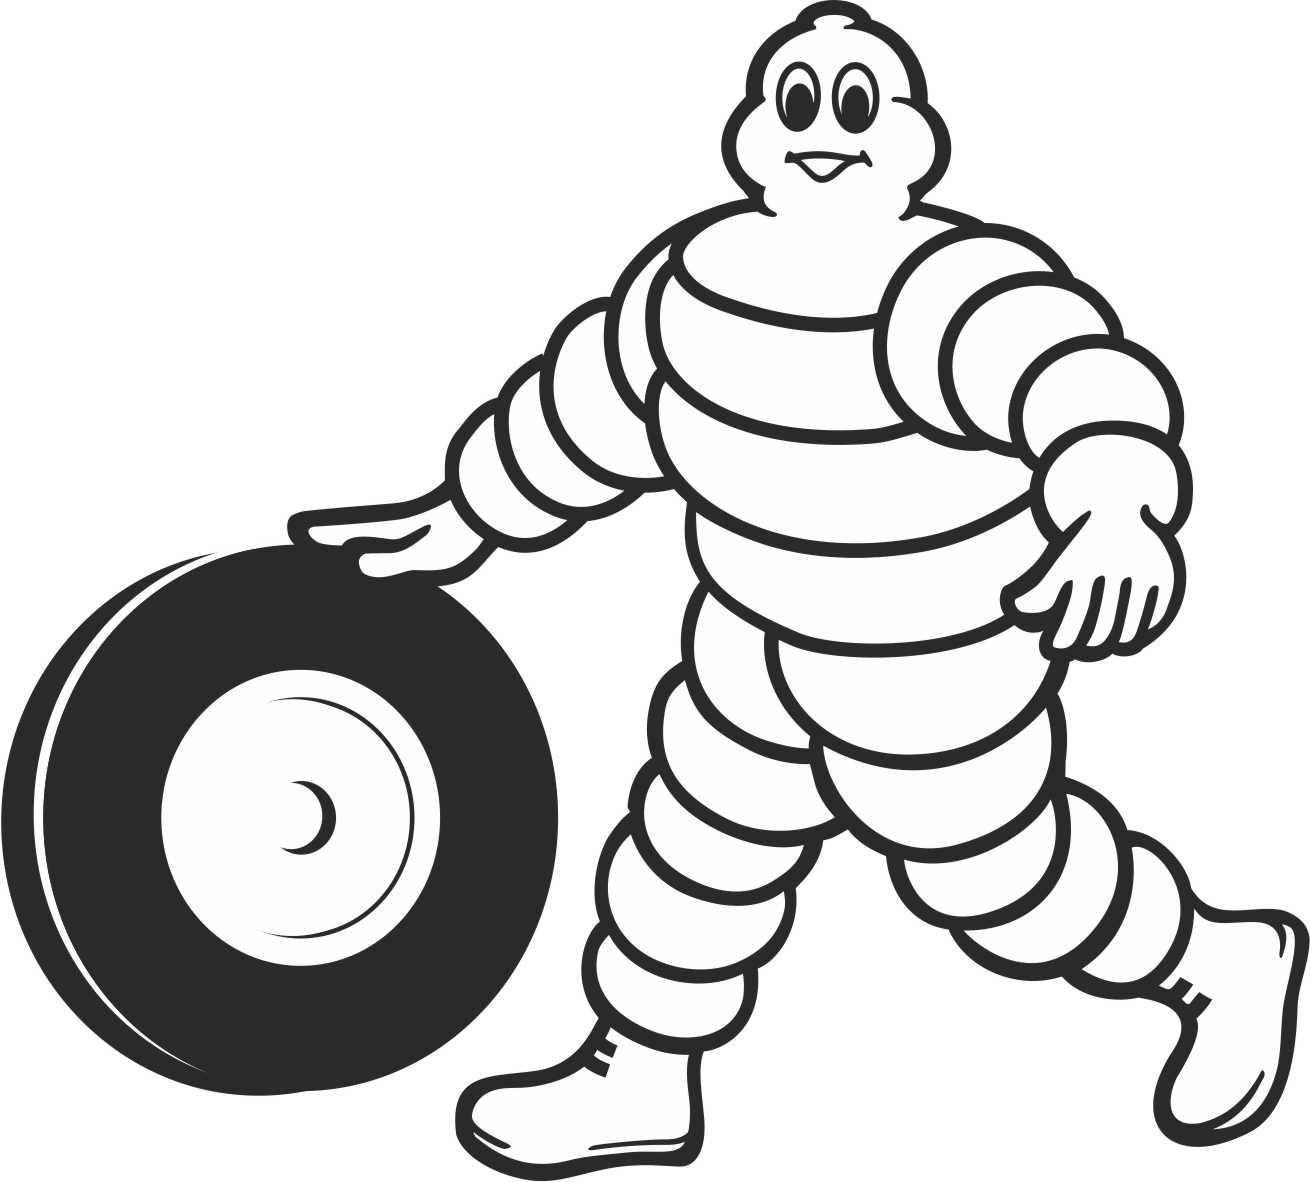 michelin-man-bibendum-tyre-3029-p